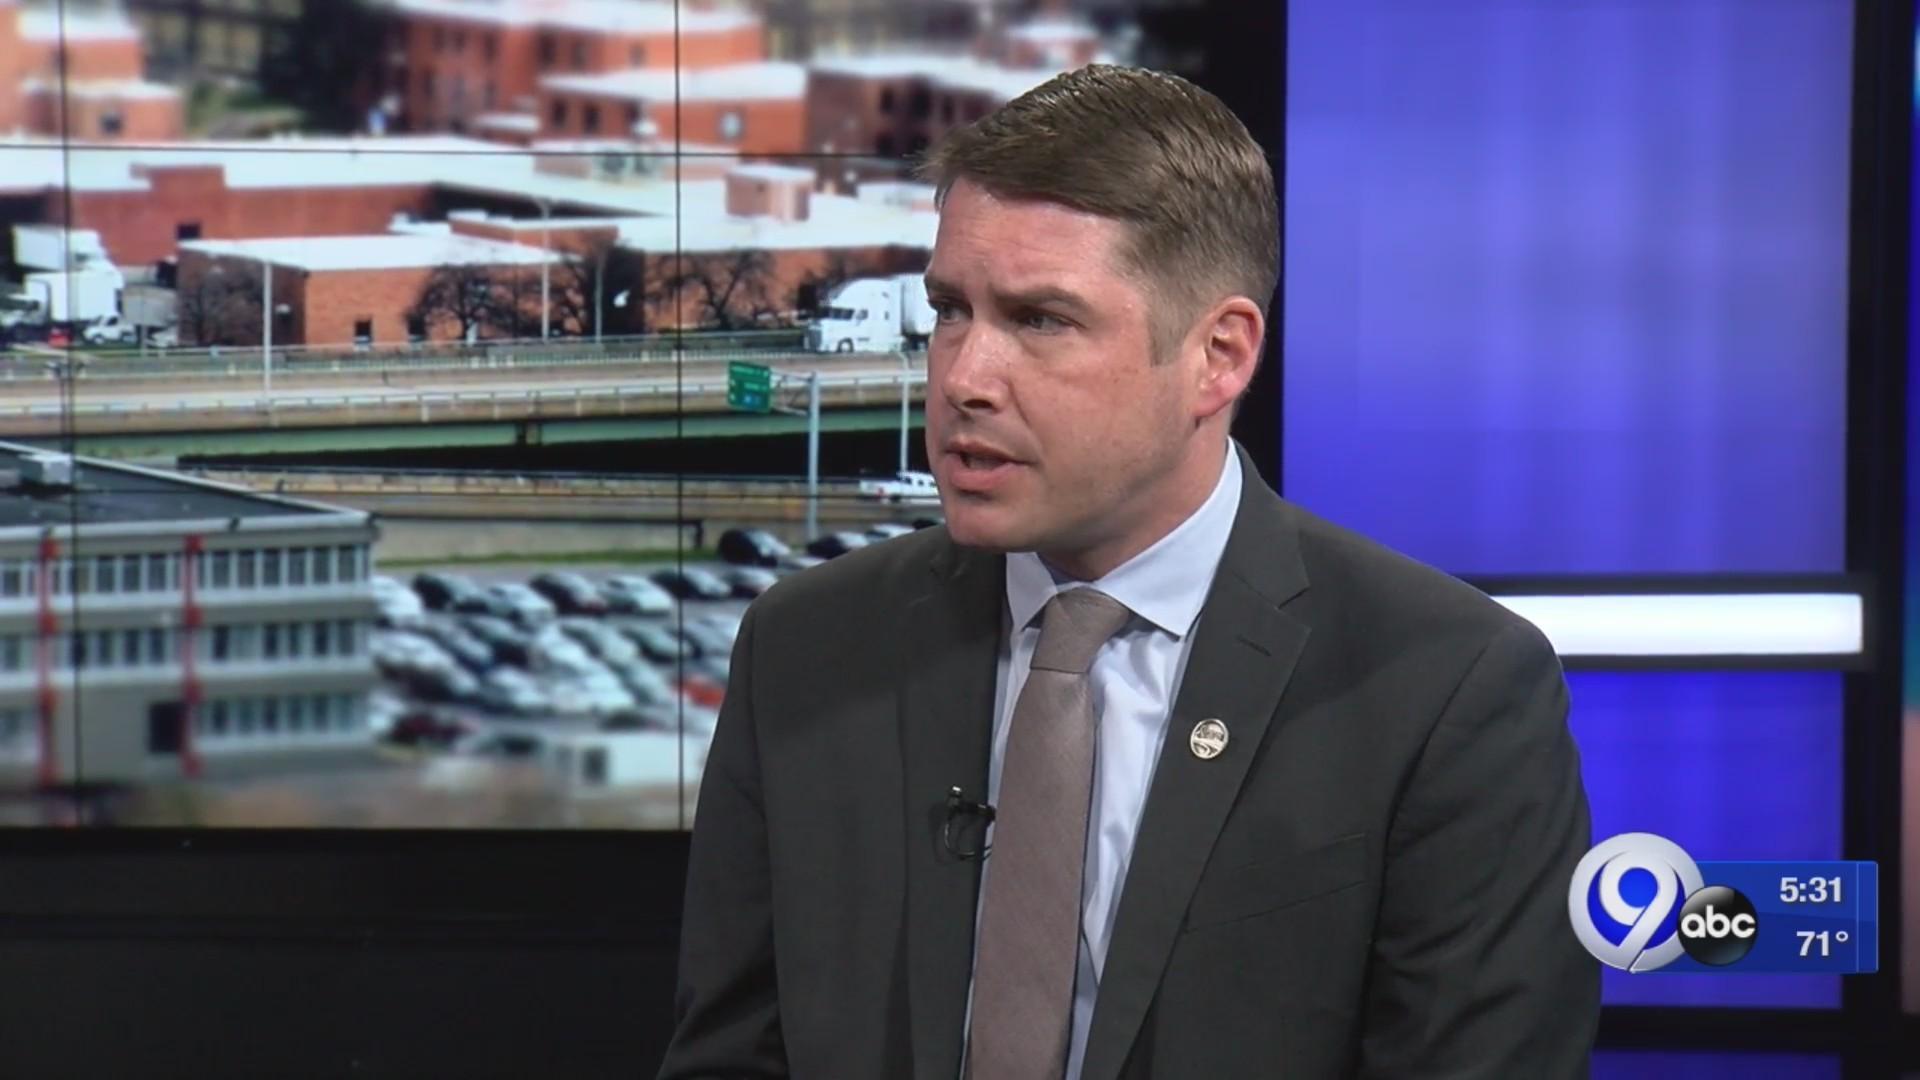 Mayor_Ben_Walsh_talks_81_changes_0_20190423231921